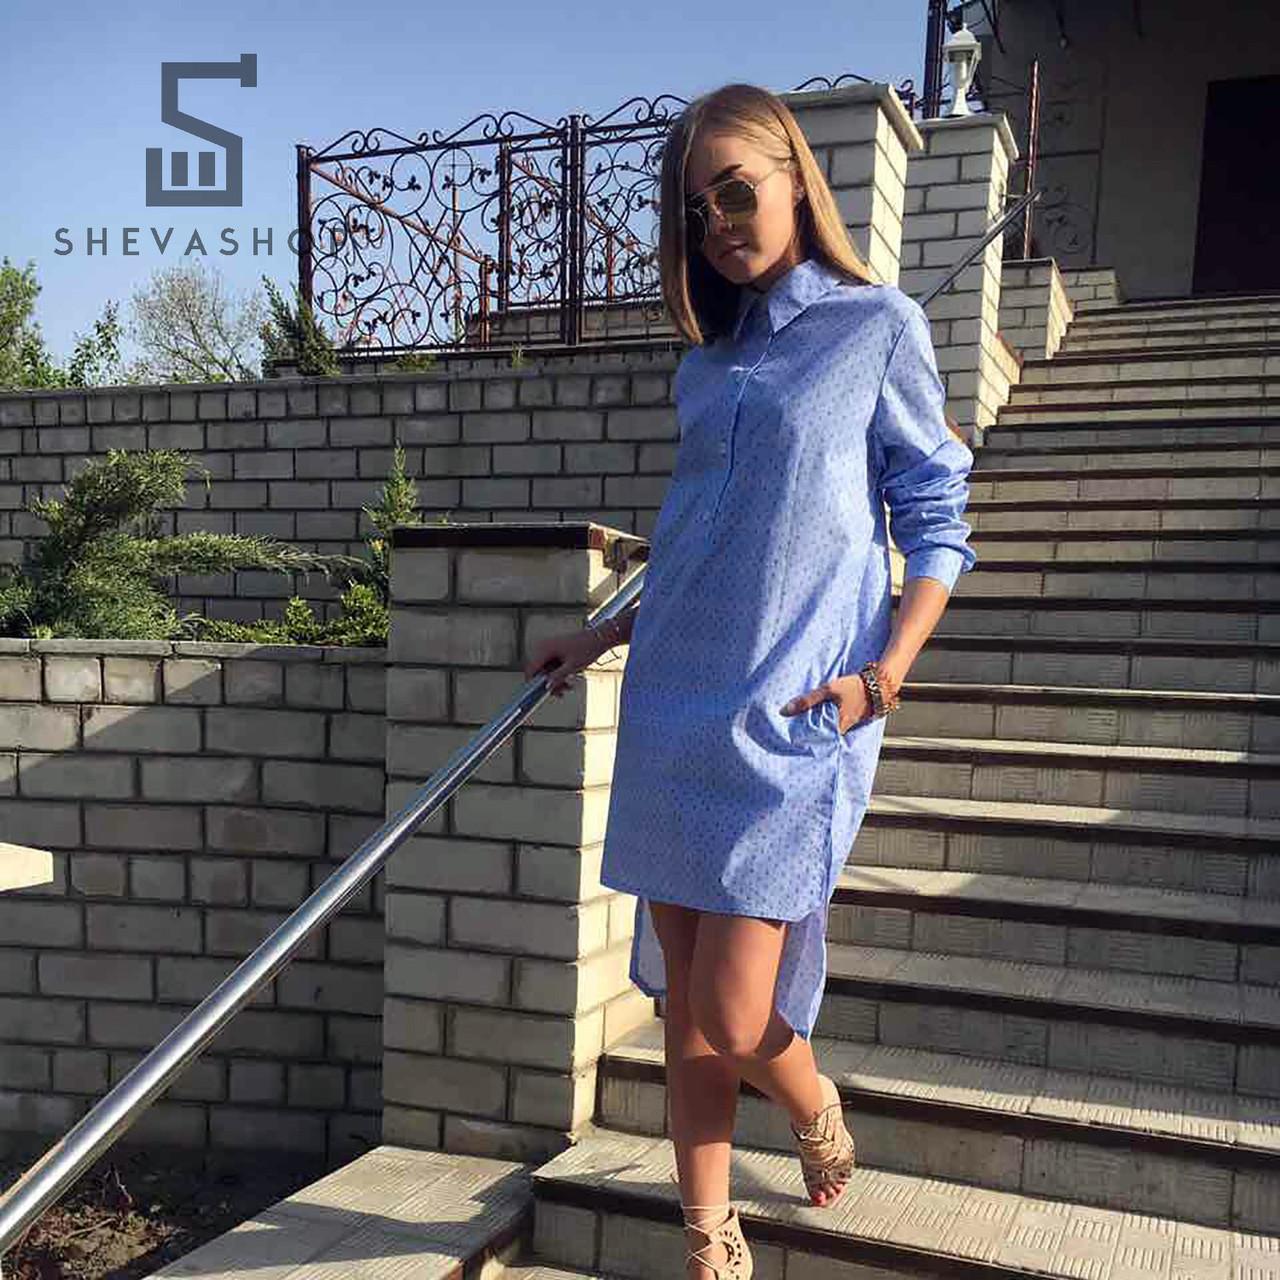 Летнее платье-рубашка Ann Undine голубое, фото 1